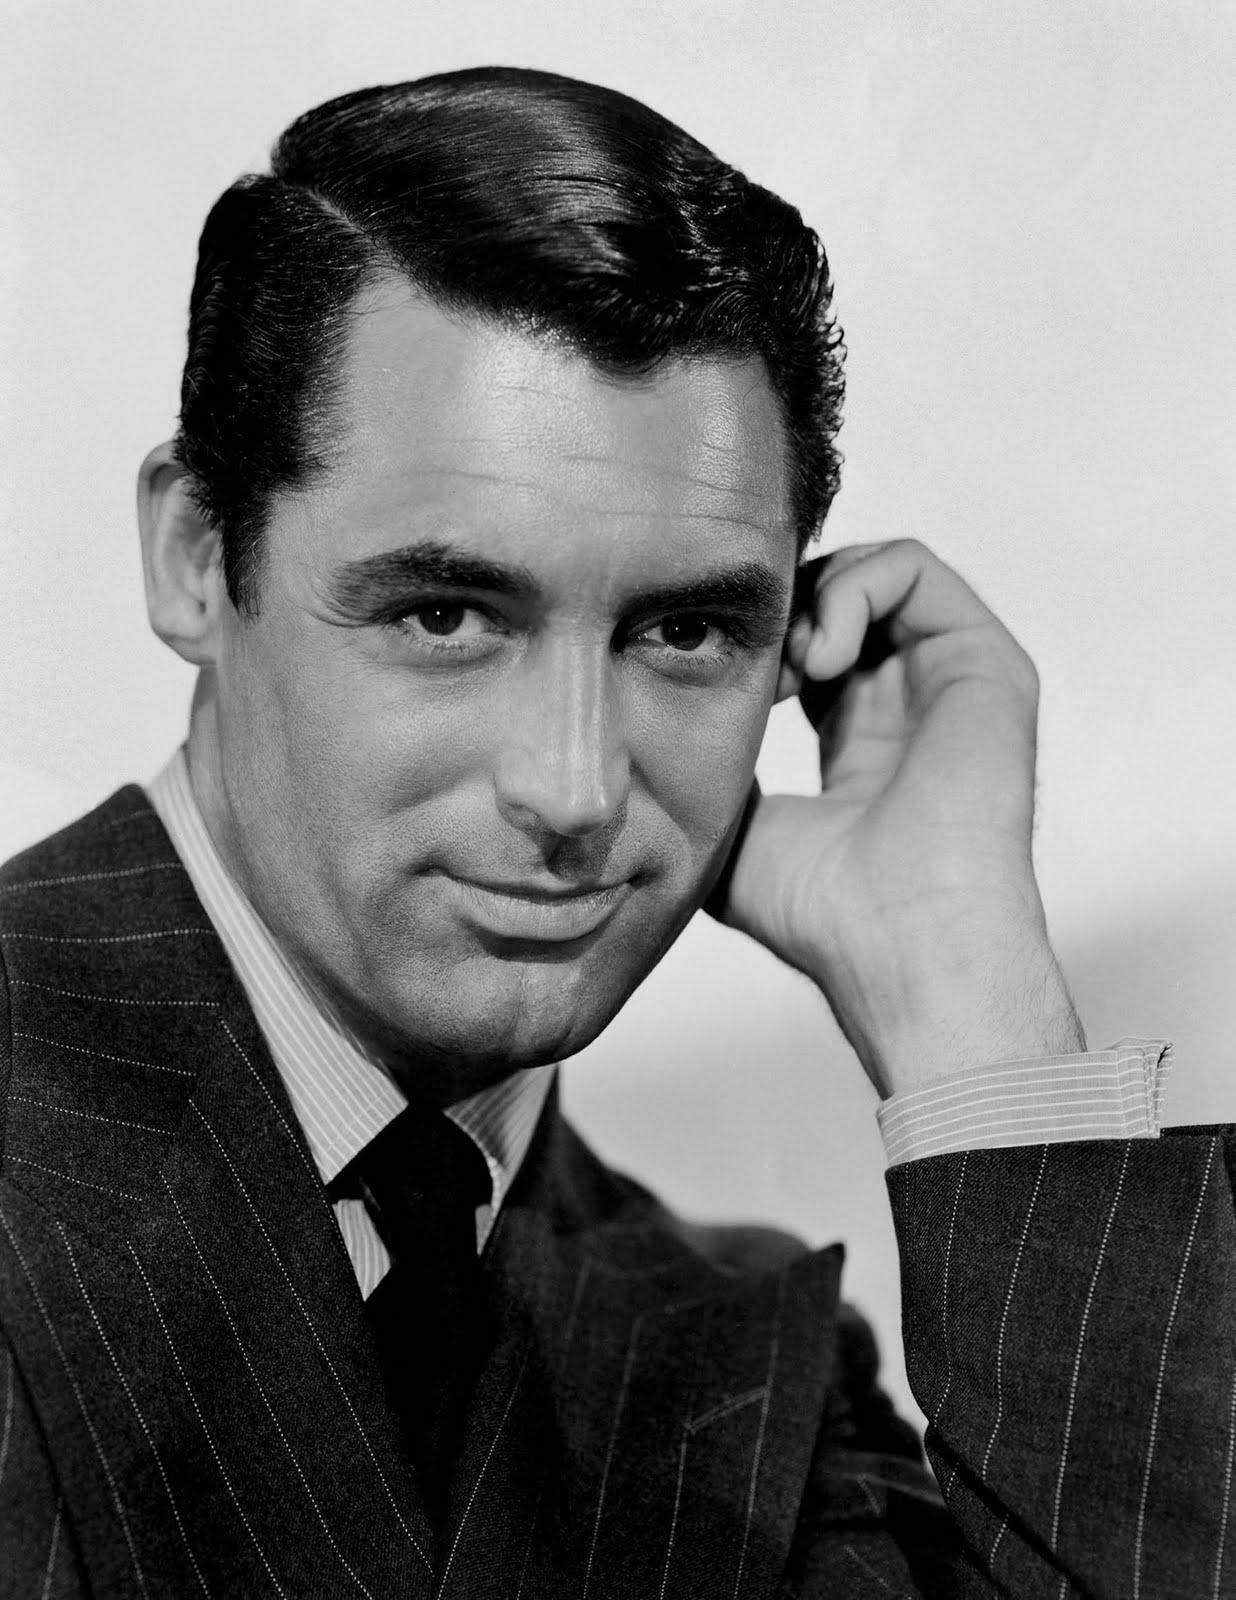 Night Owls Sb Cary Grant 1 18 1904 To 11 29 1986